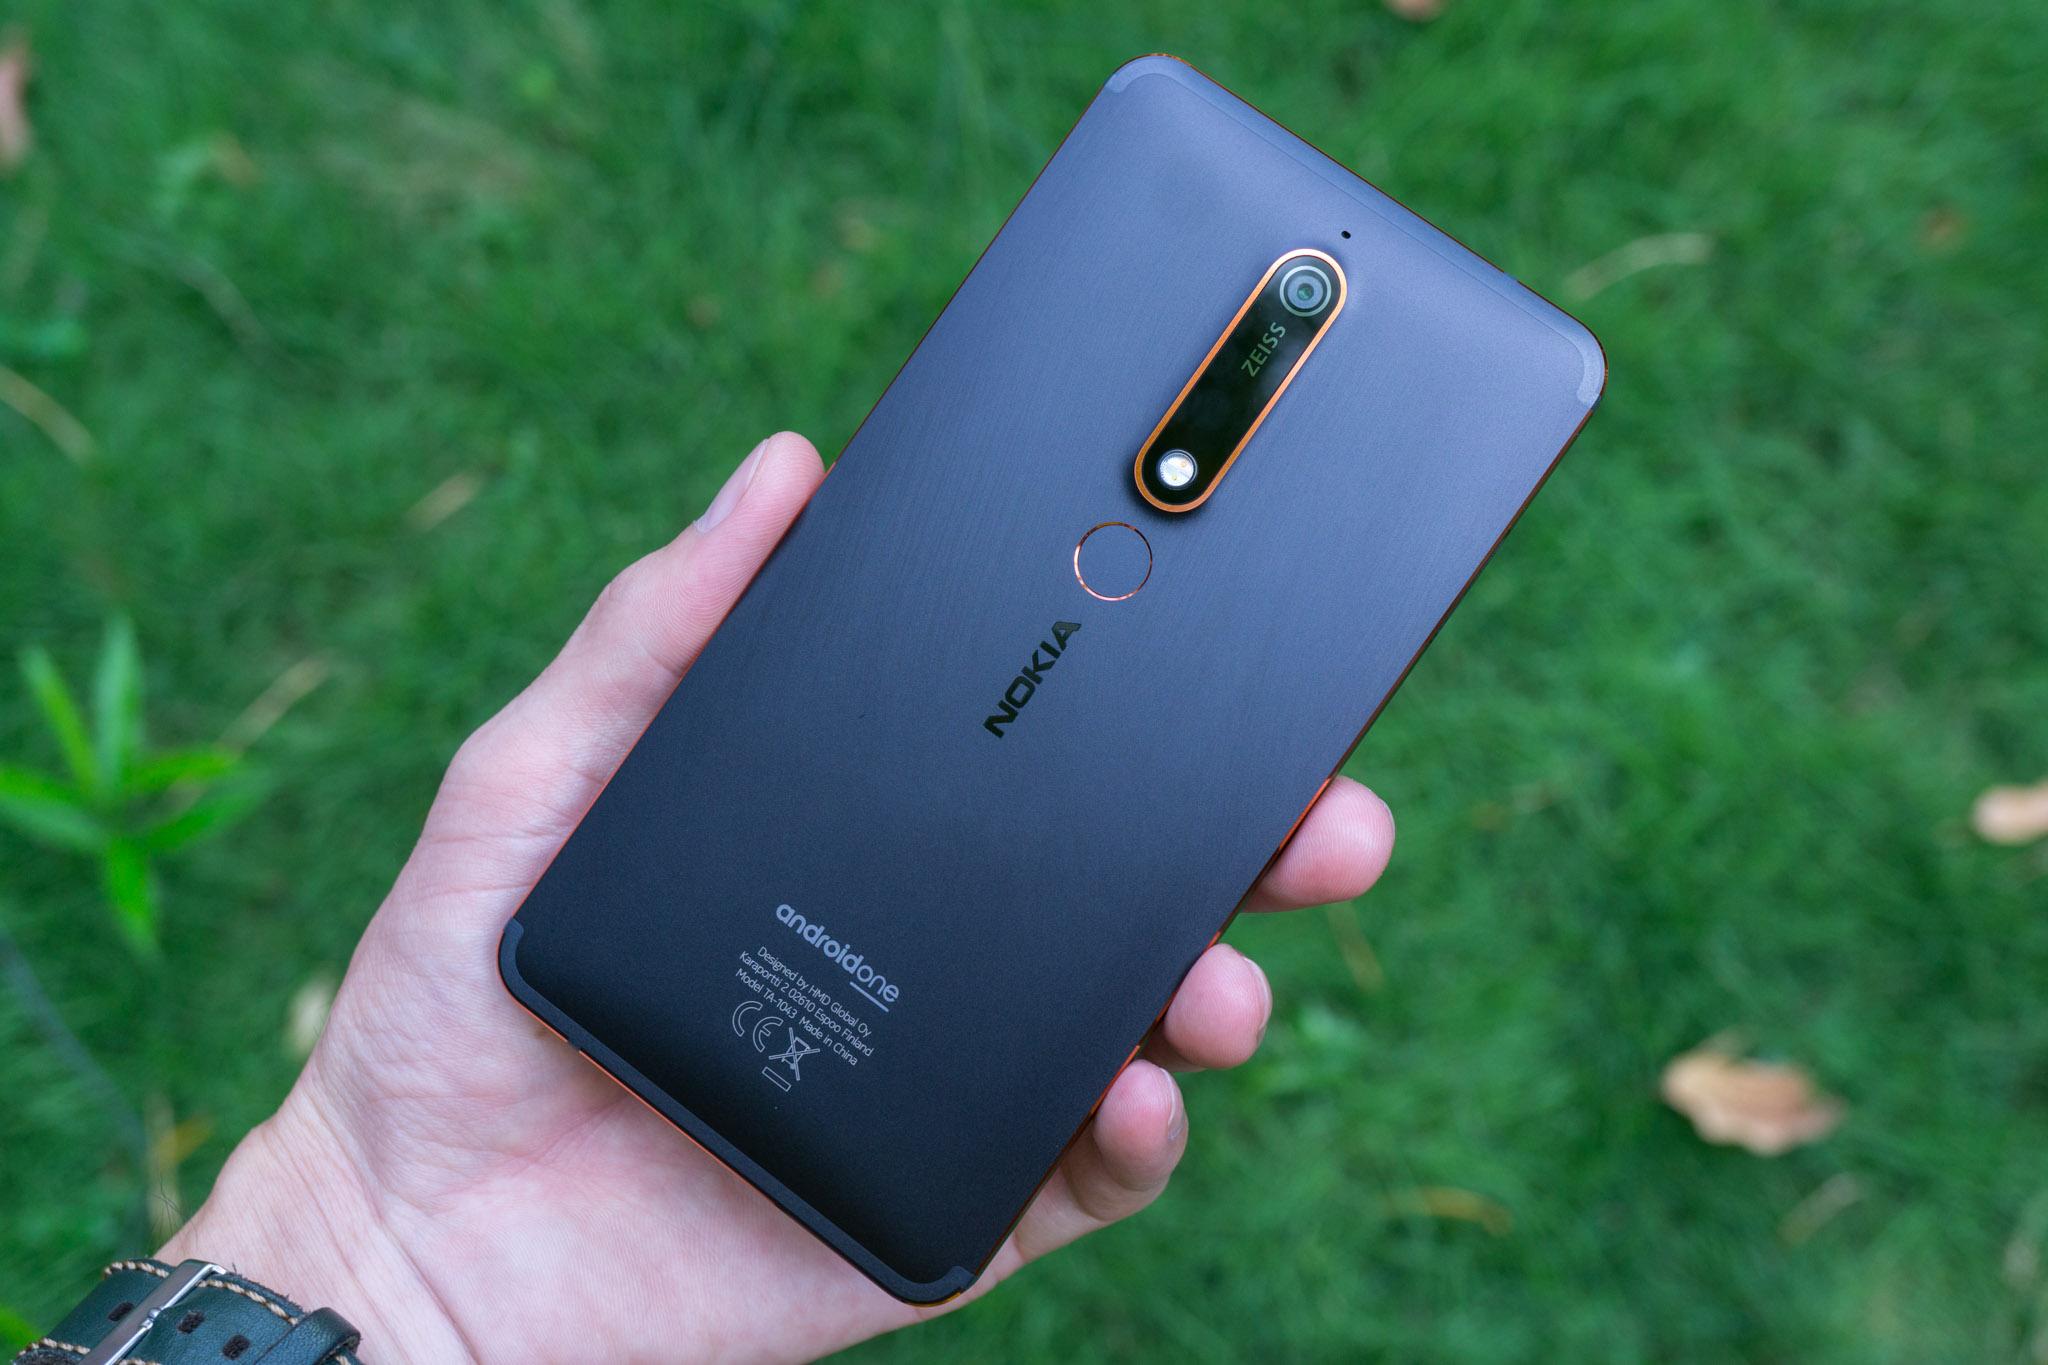 Nokia 6 mới_-23.jpg